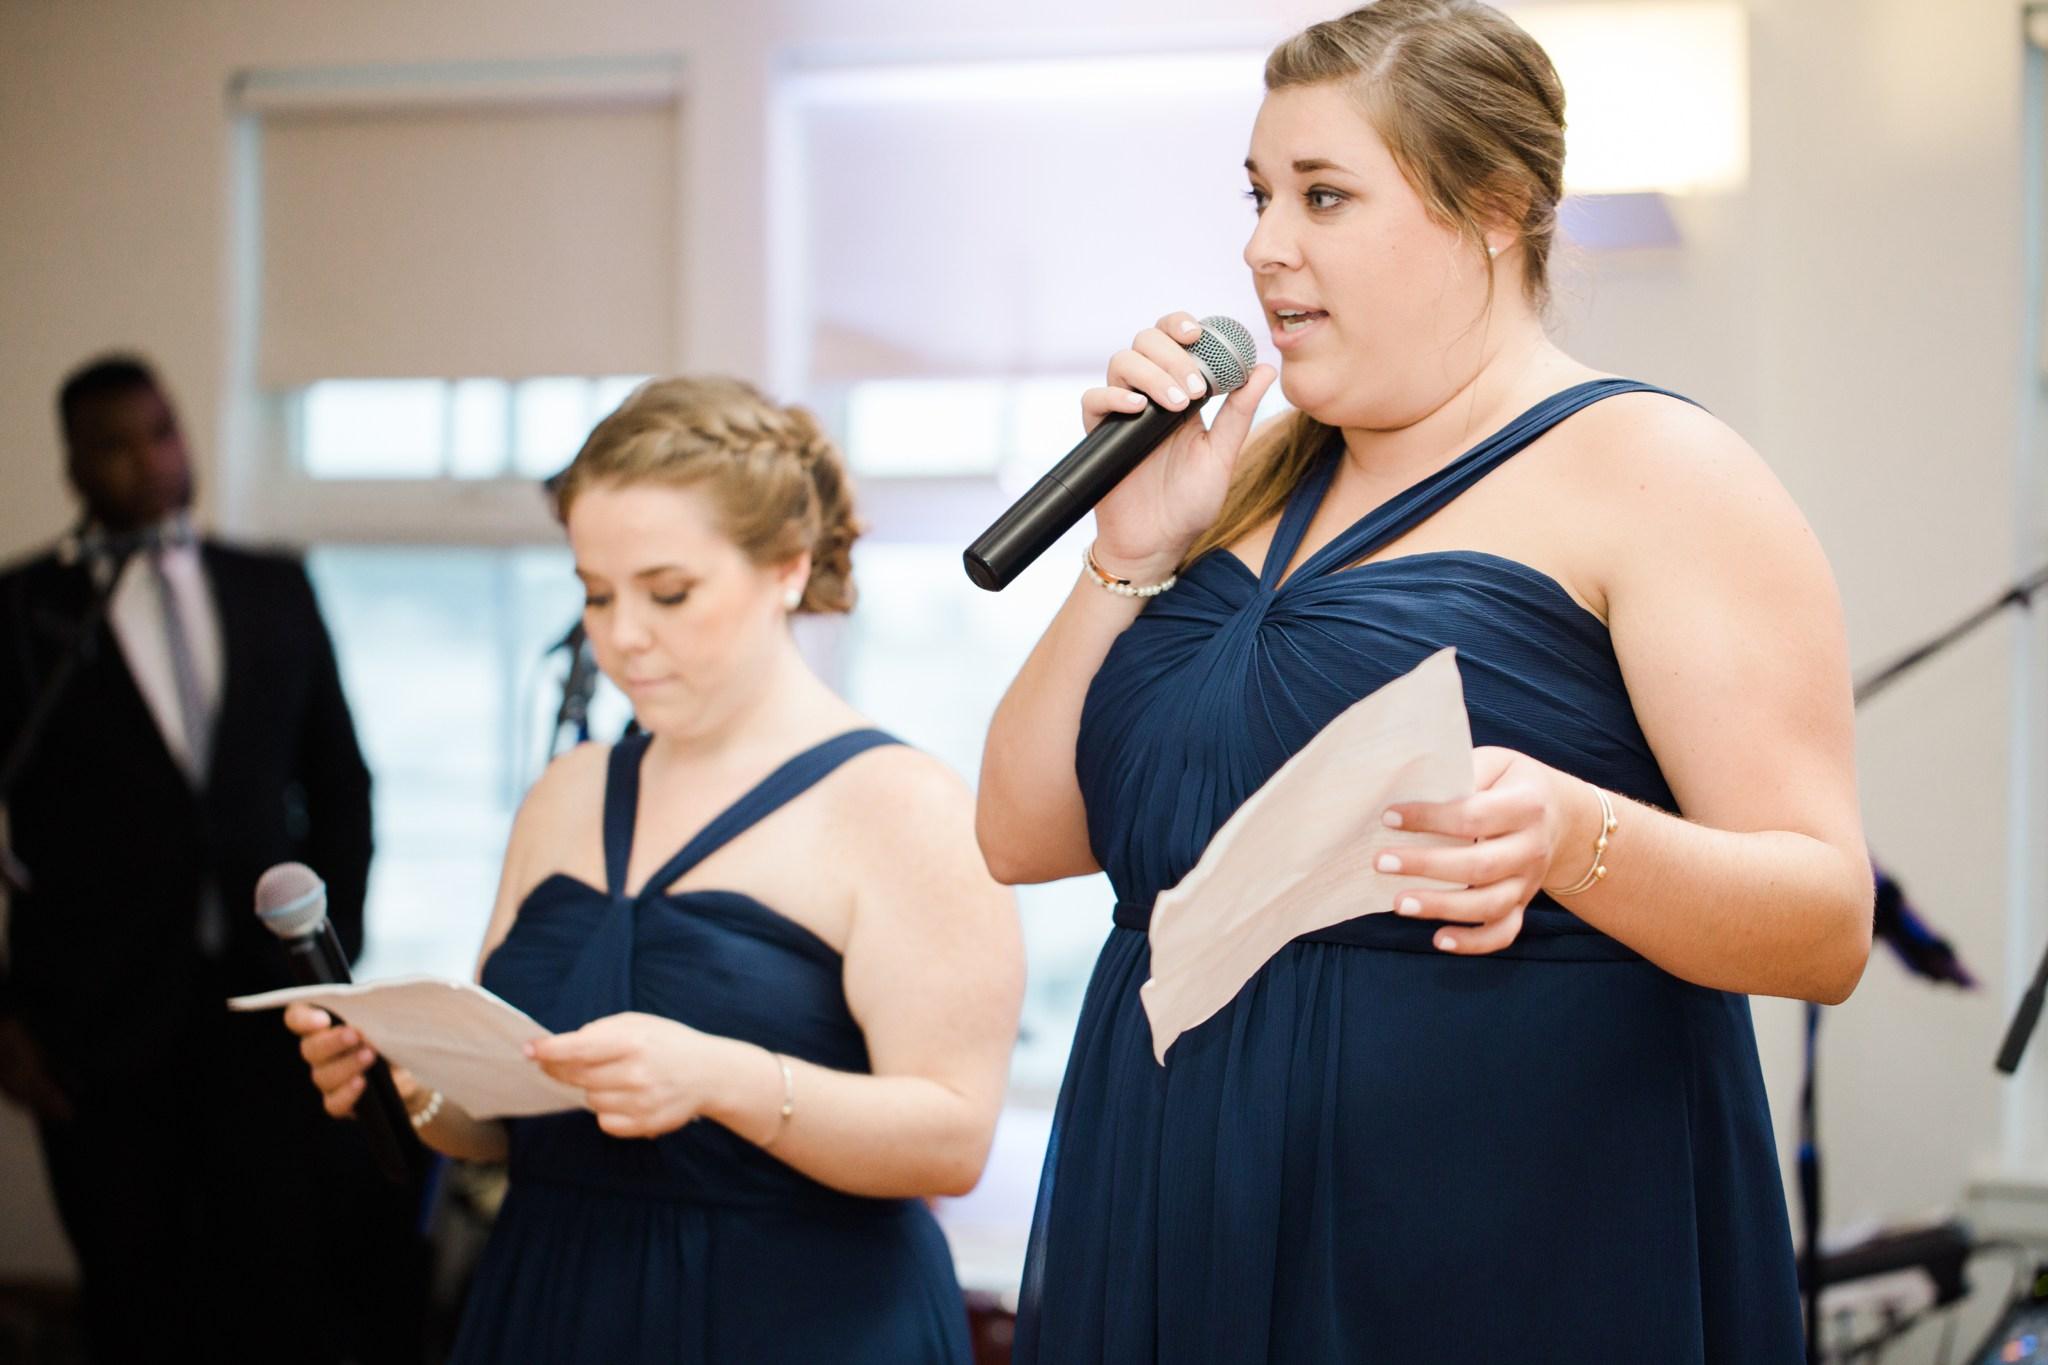 duxbury_bay_maritime_school_wedding_deborah_zoe_0047.JPG